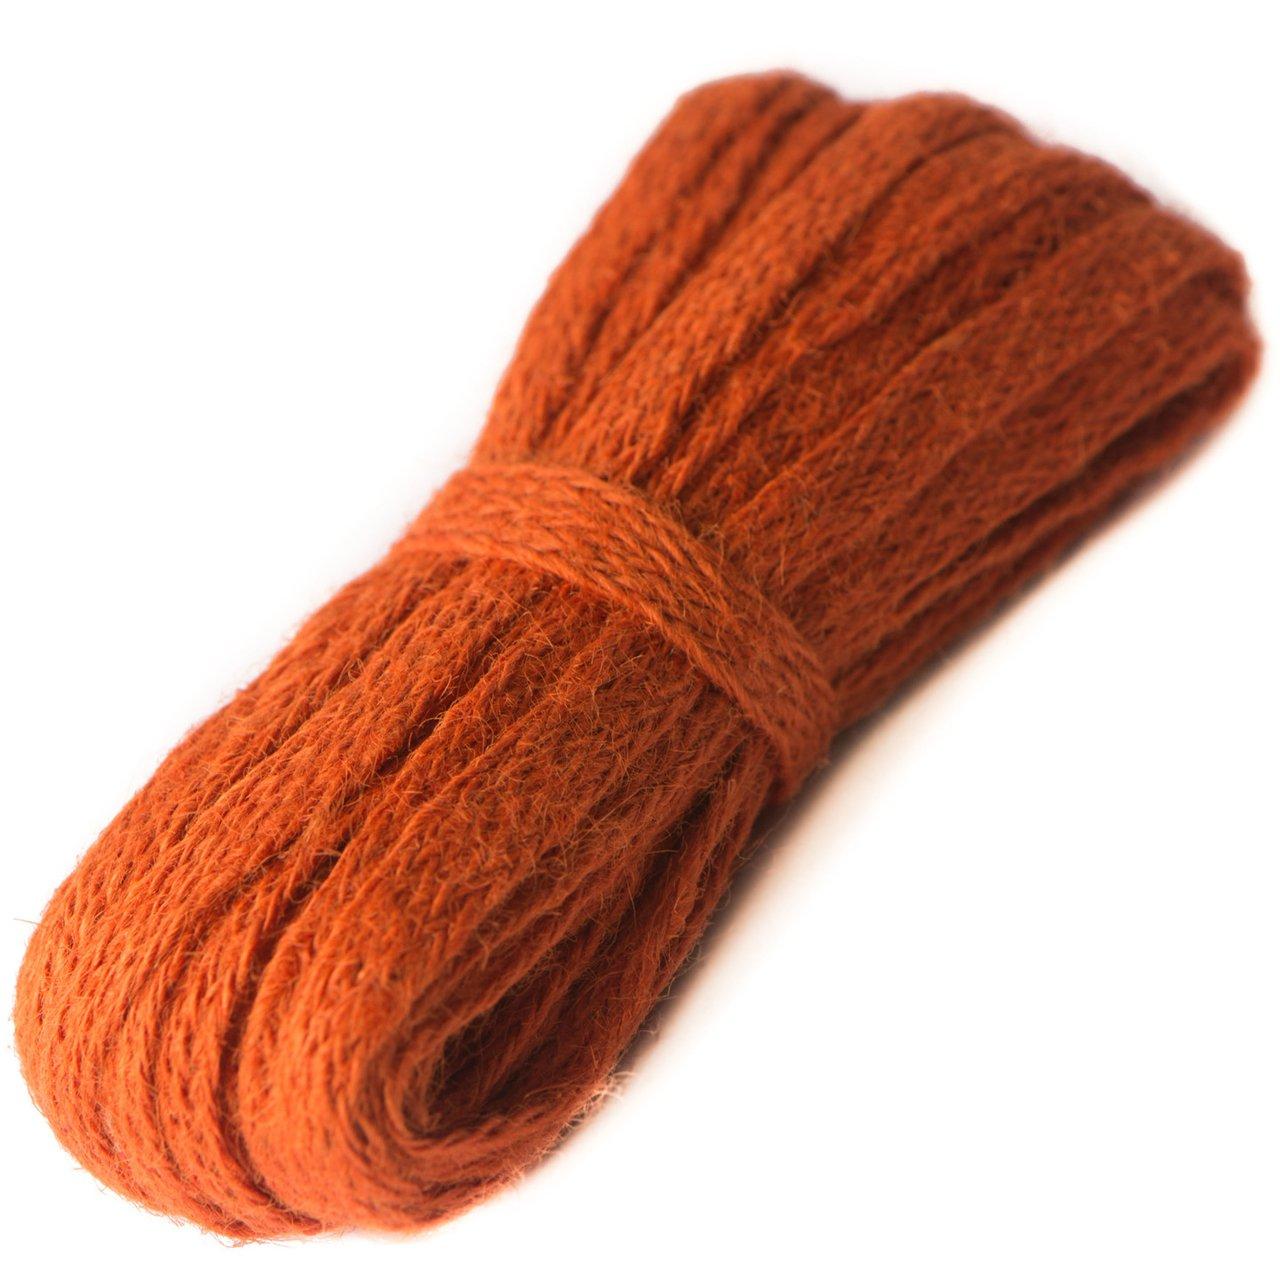 Jute Ribbon - Orange